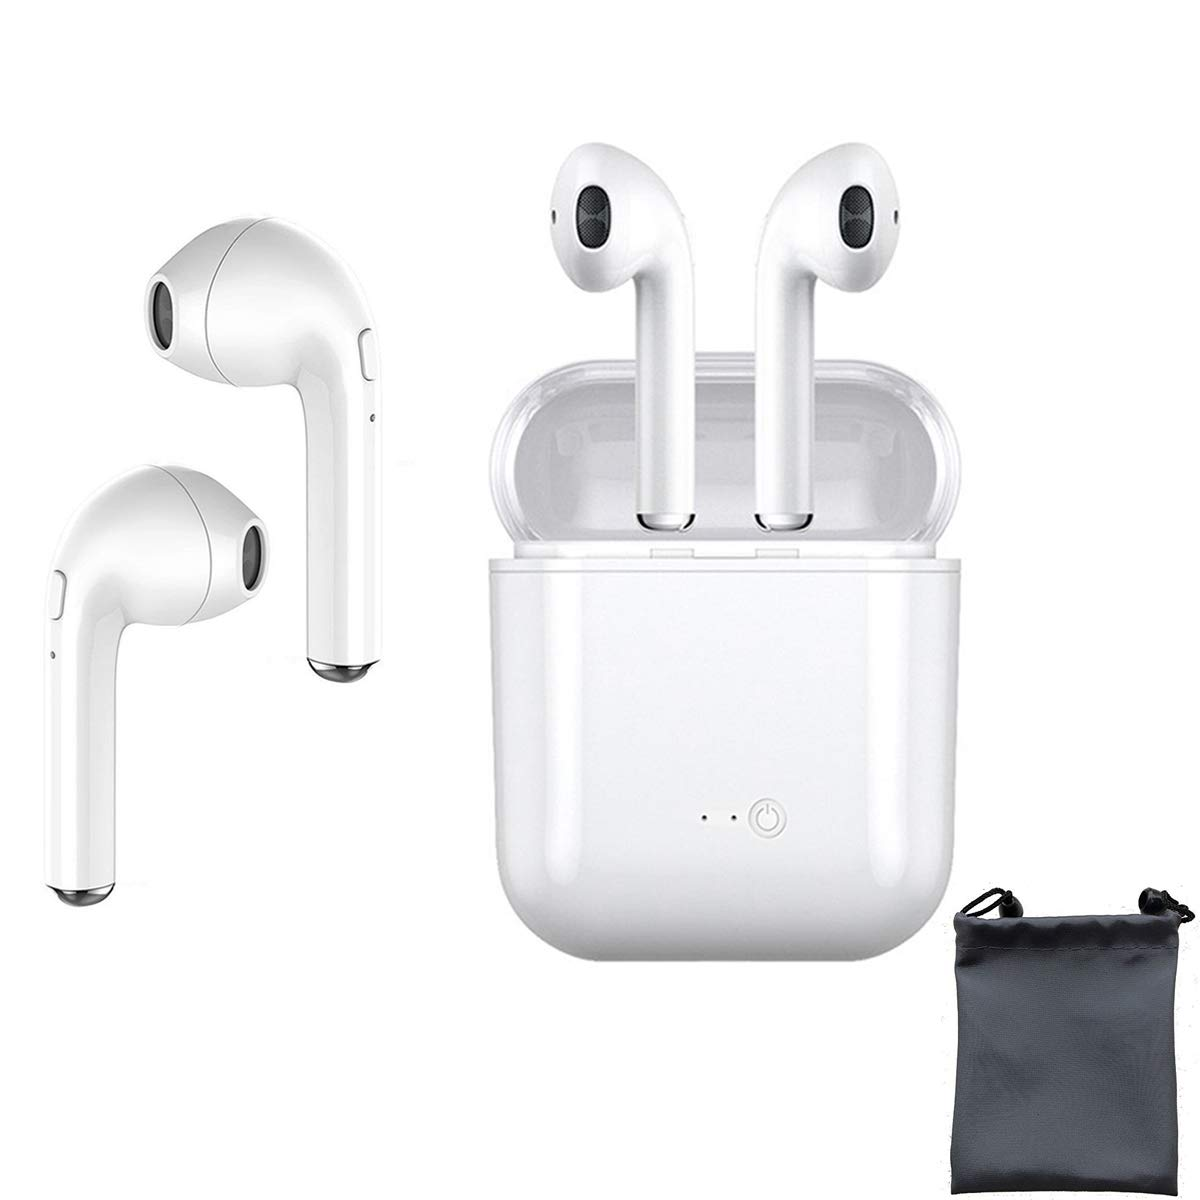 TJSDAN Bluetooth Headset, Wireless Headphones Sports Headphones with Noise Reduction Headphones, Microphone with Microphone, Mini in-Ear Earphones, Earphones, Sweat-Proof Sports Earphones